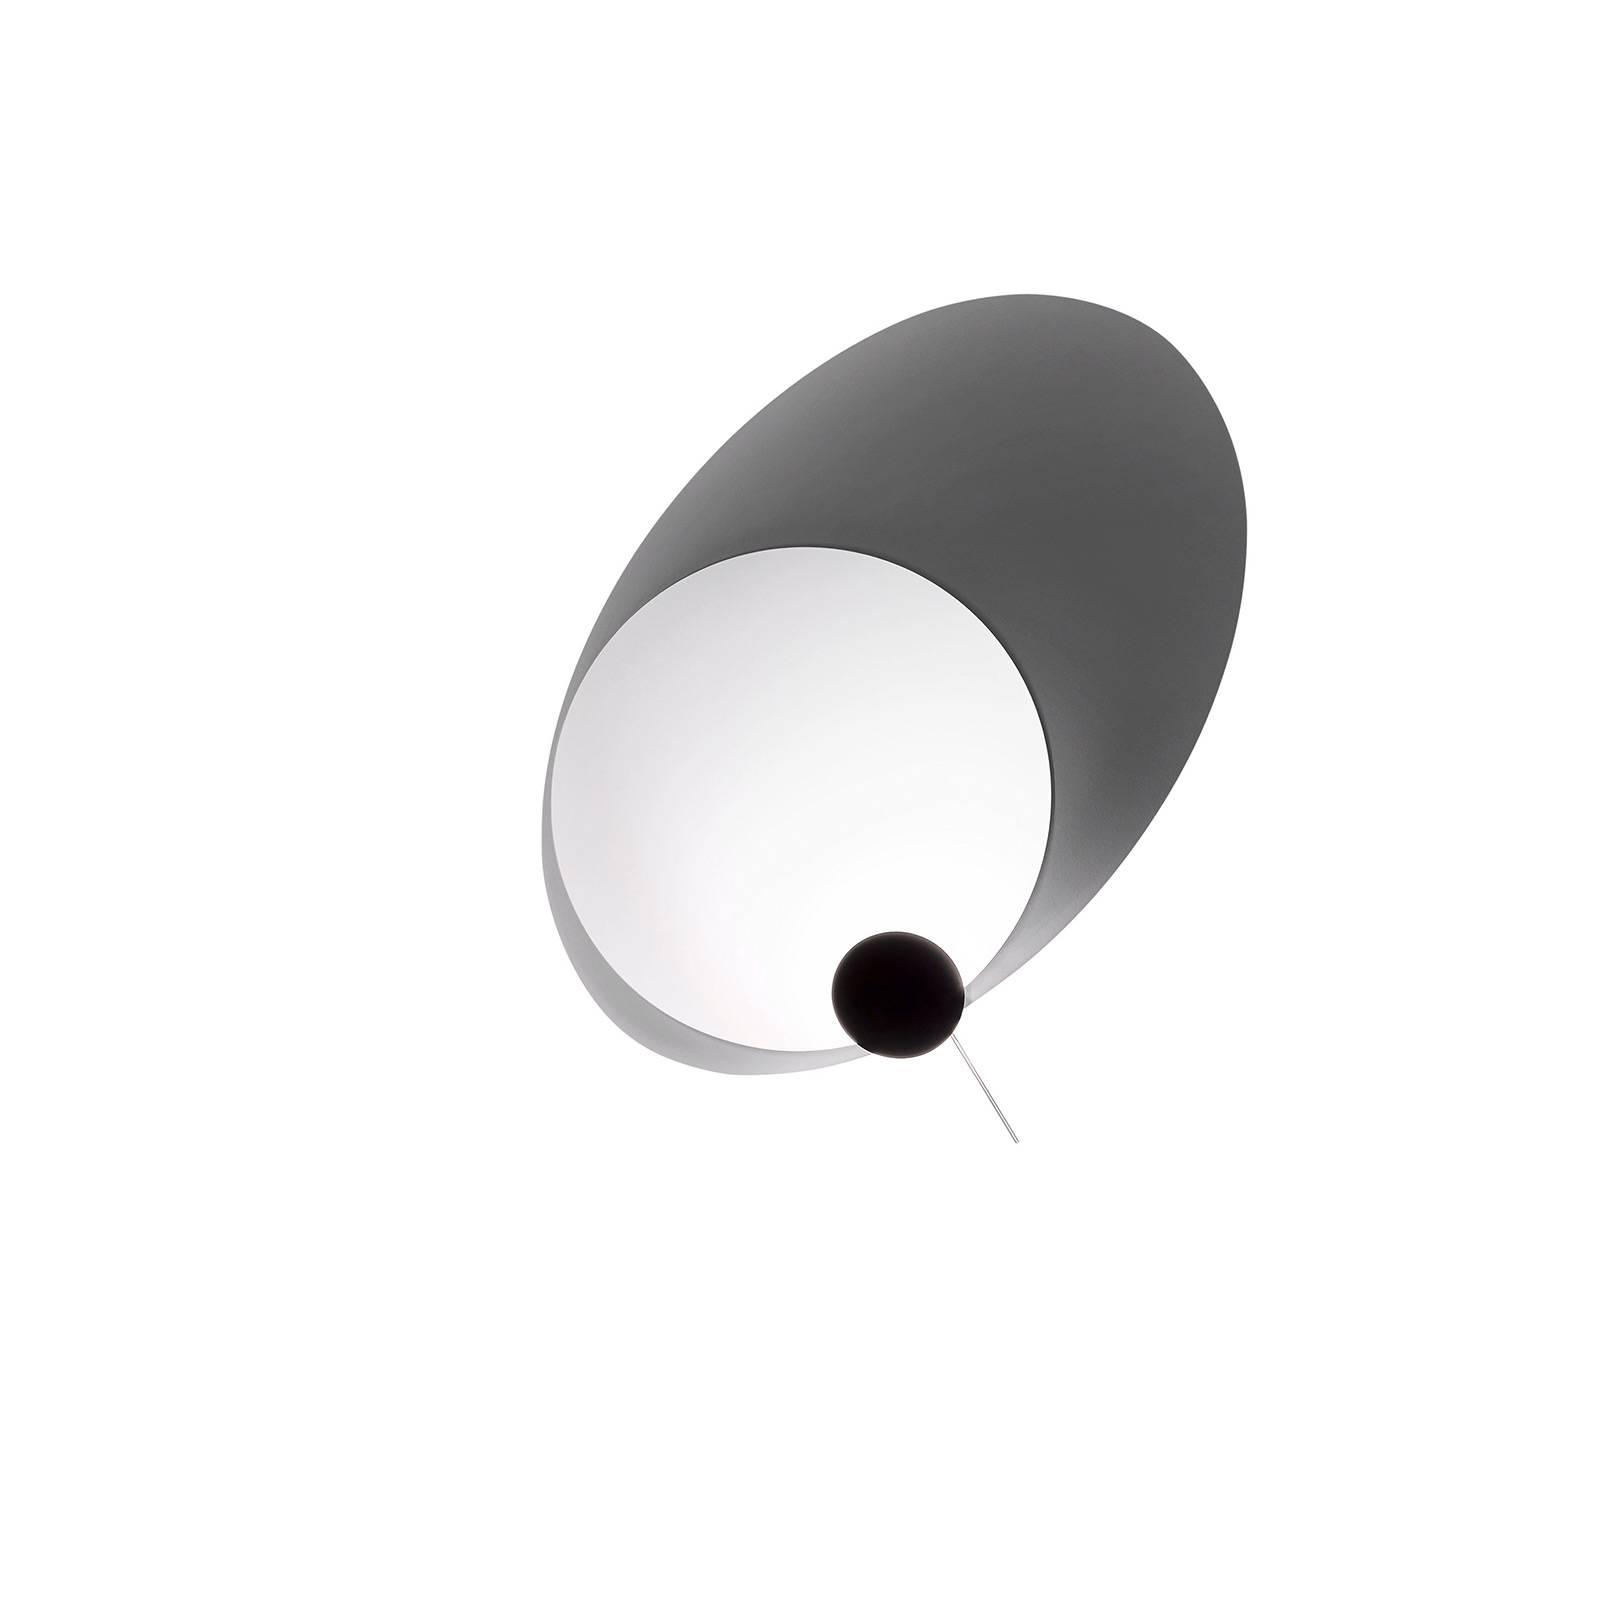 Ingo Maurer Eclipse Ellipse -LED-seinävalaisin